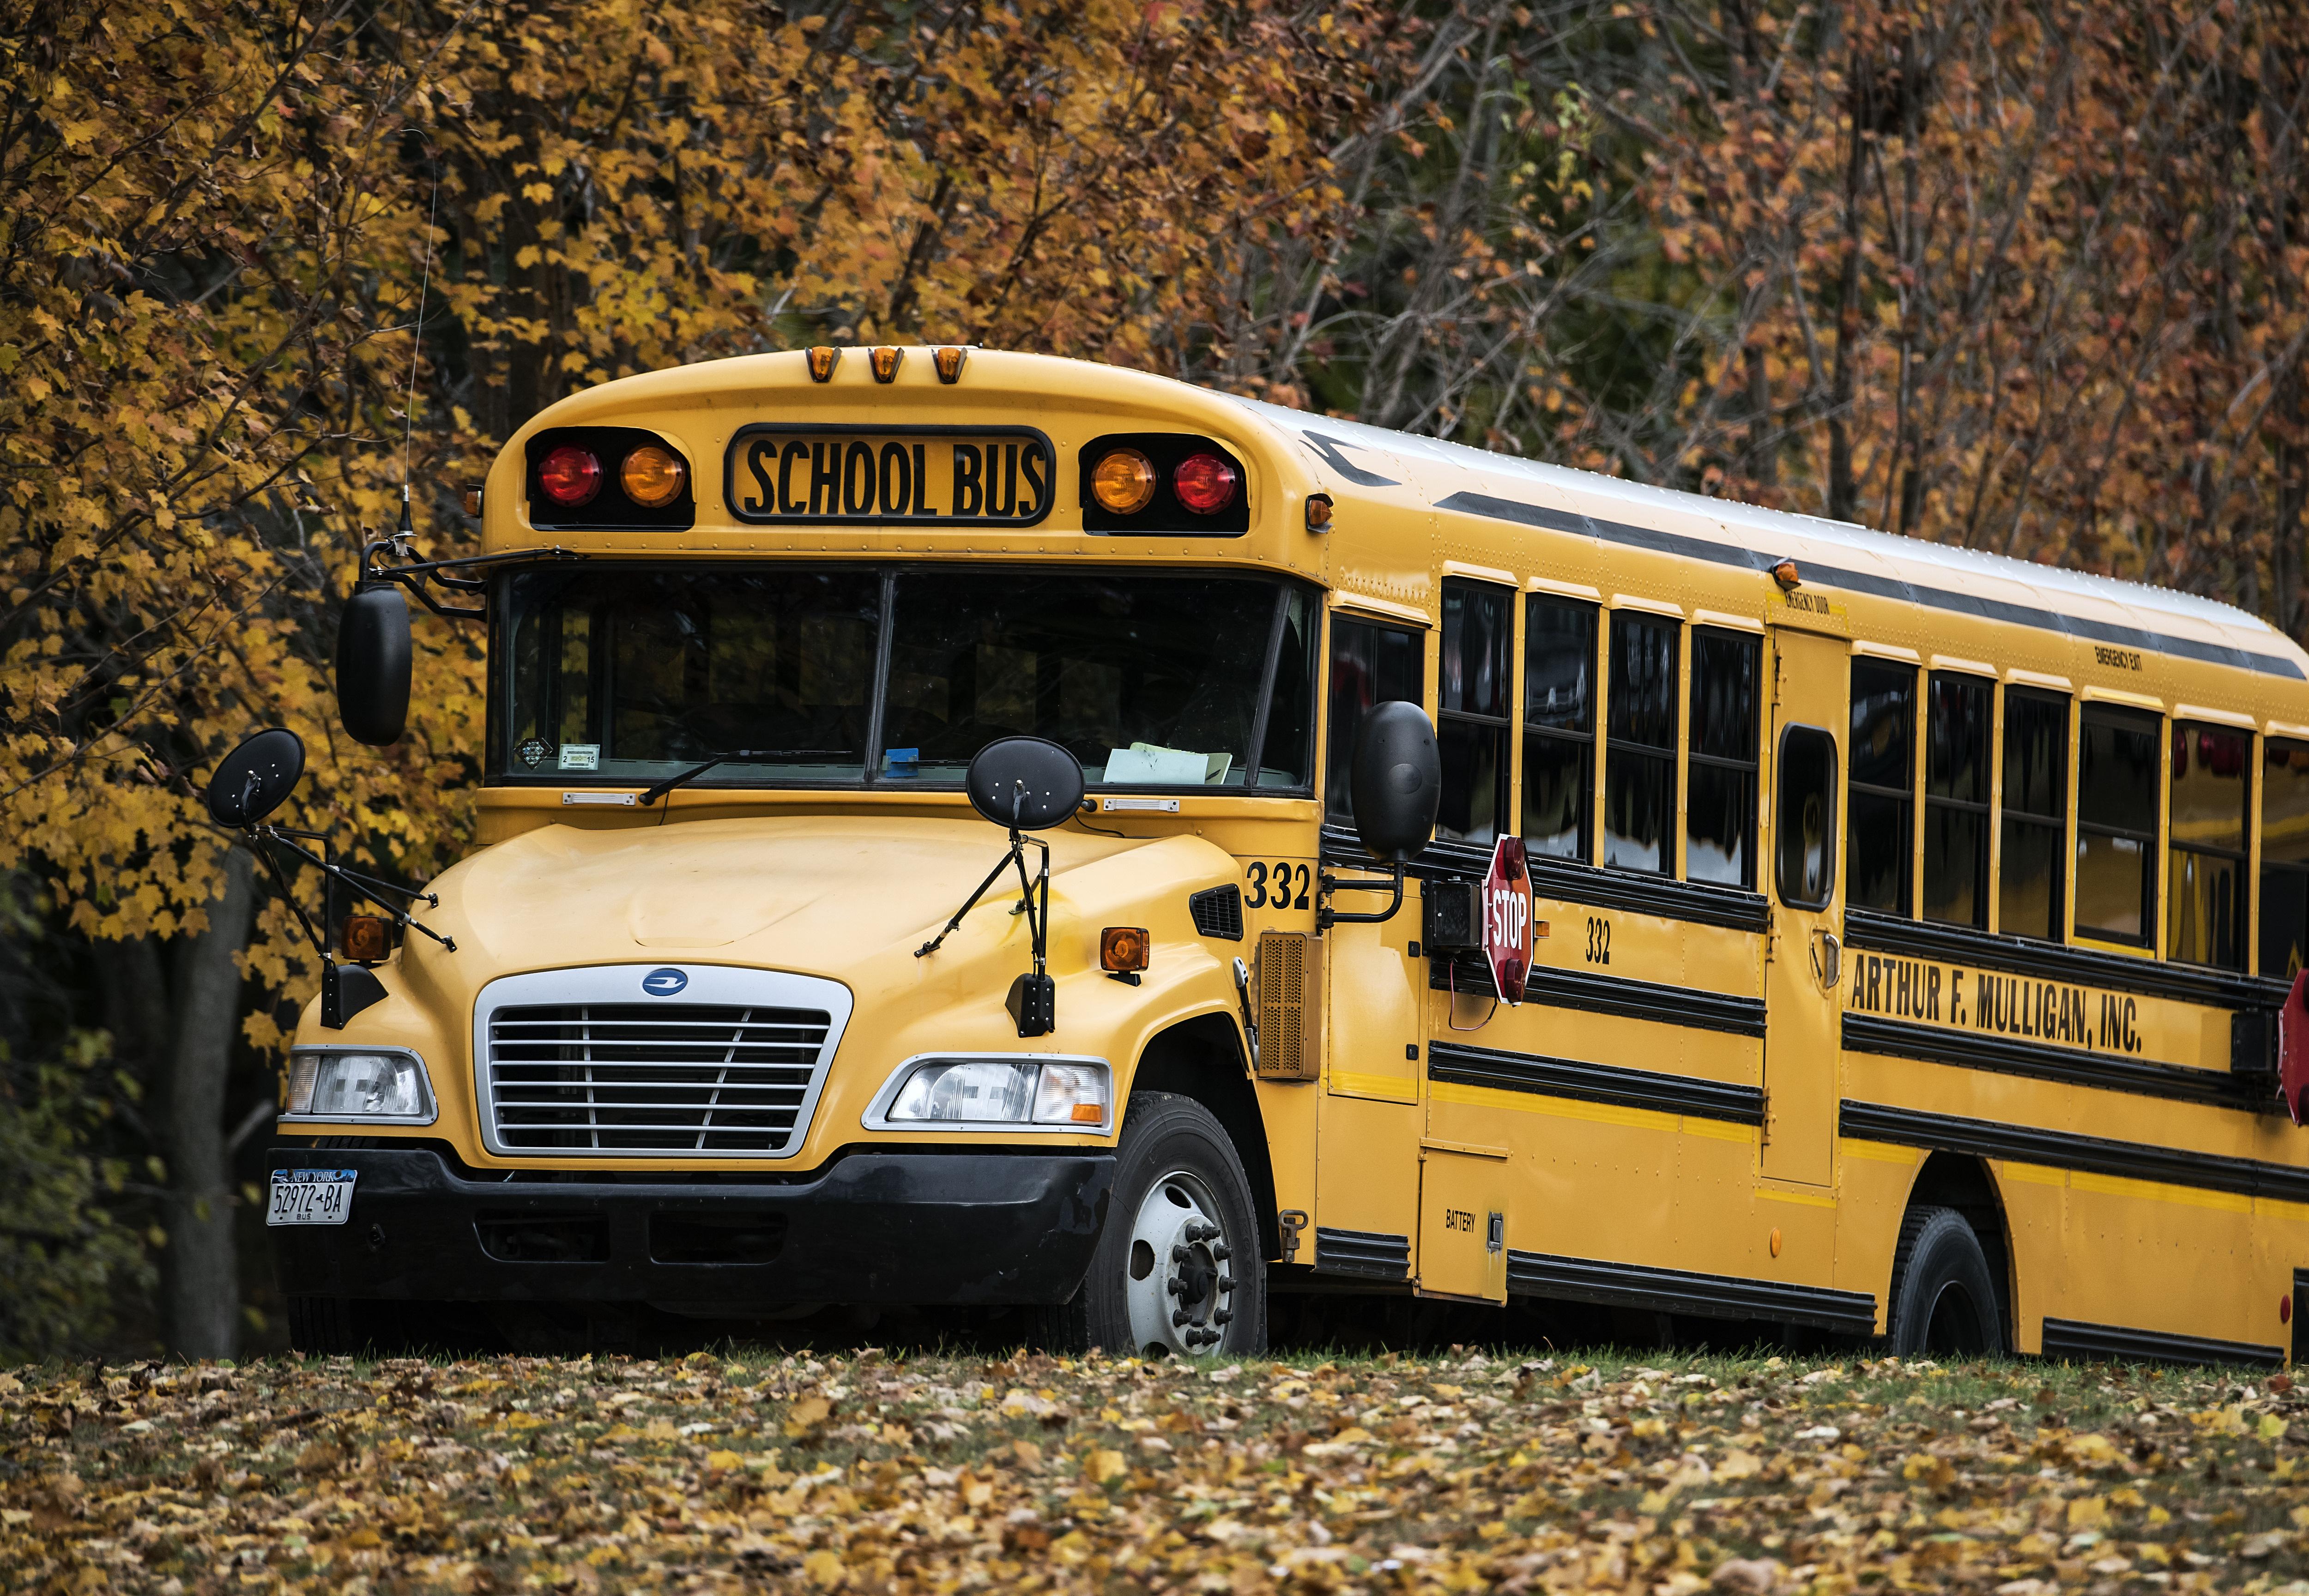 School bus on rural autumn route.